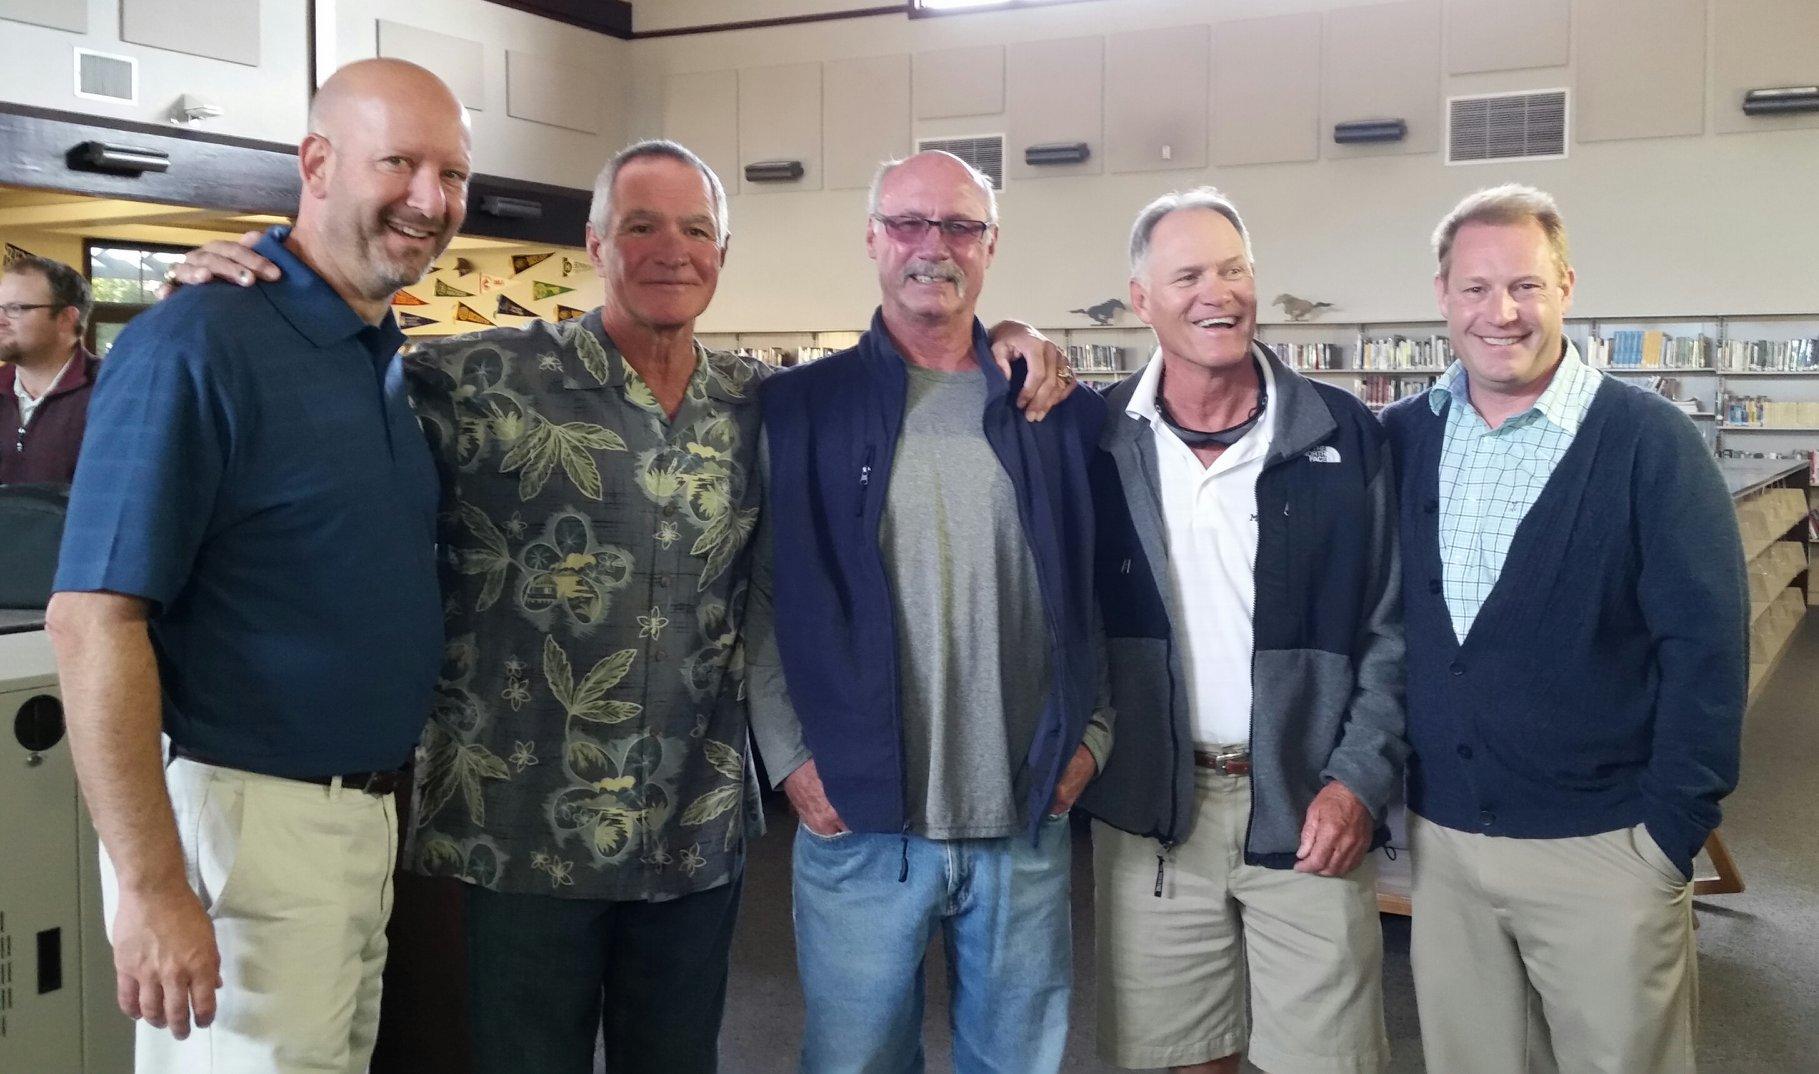 Five men smile for the camera